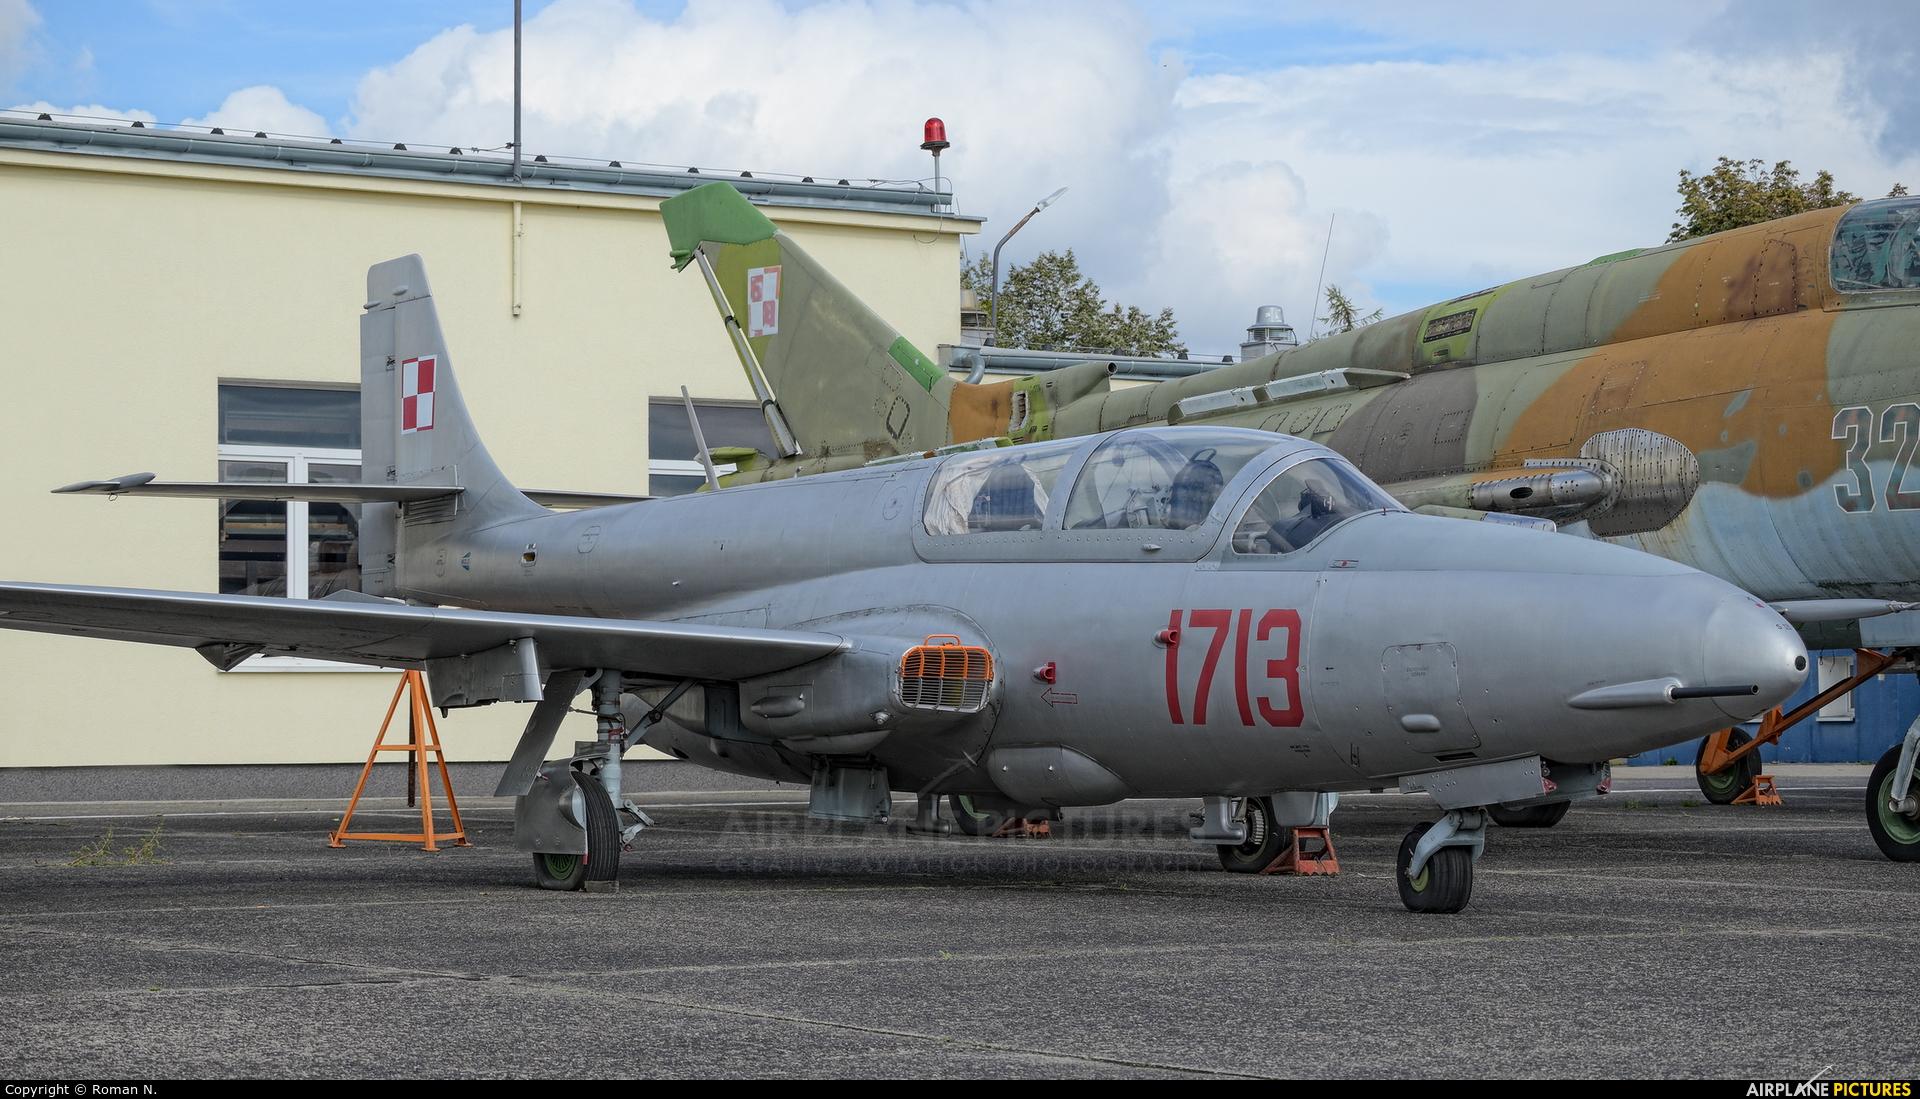 Poland - Air Force 1713 aircraft at Bydgoszcz - Szwederowo